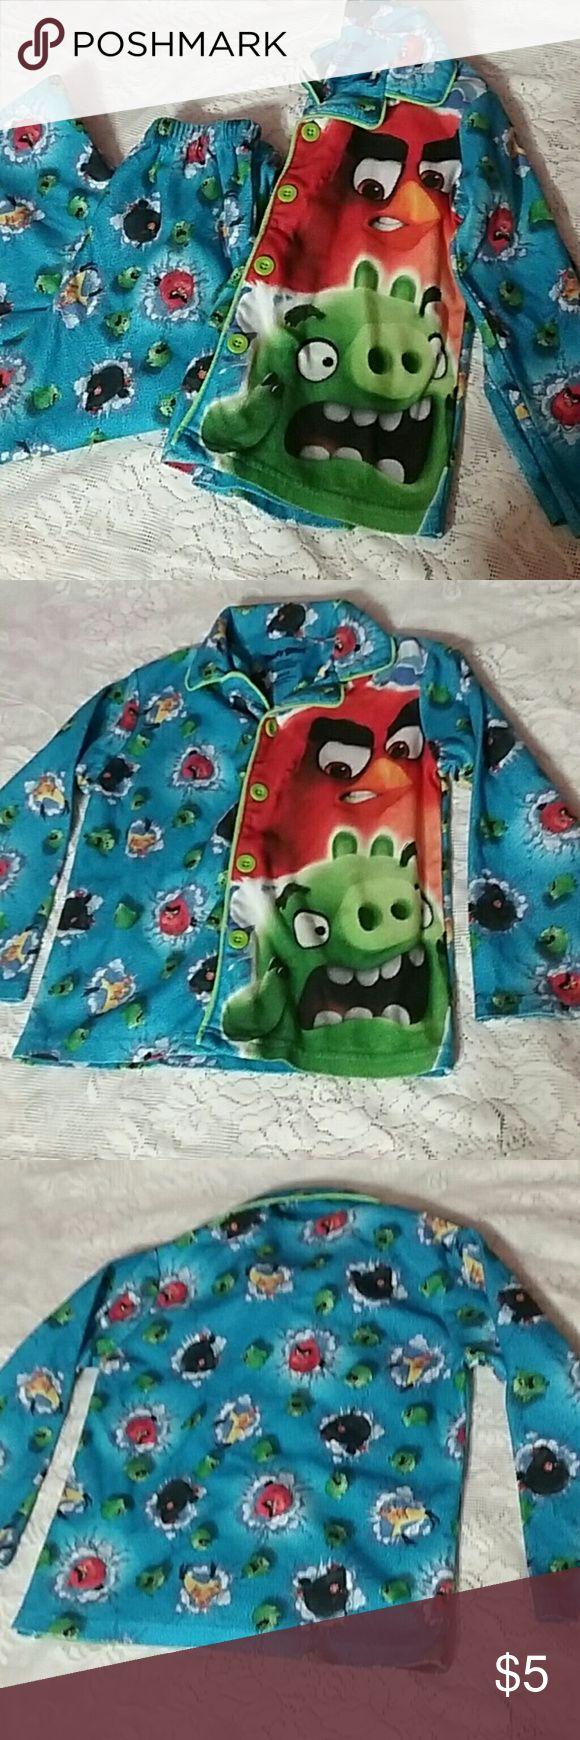 I just added this listing on Poshmark: Boys 4/5 xs Pajamas Angry Birds pjs Top Pants euc. #shopmycloset #poshmark #fashion #shopping #style #forsale #Angry Birds #Other